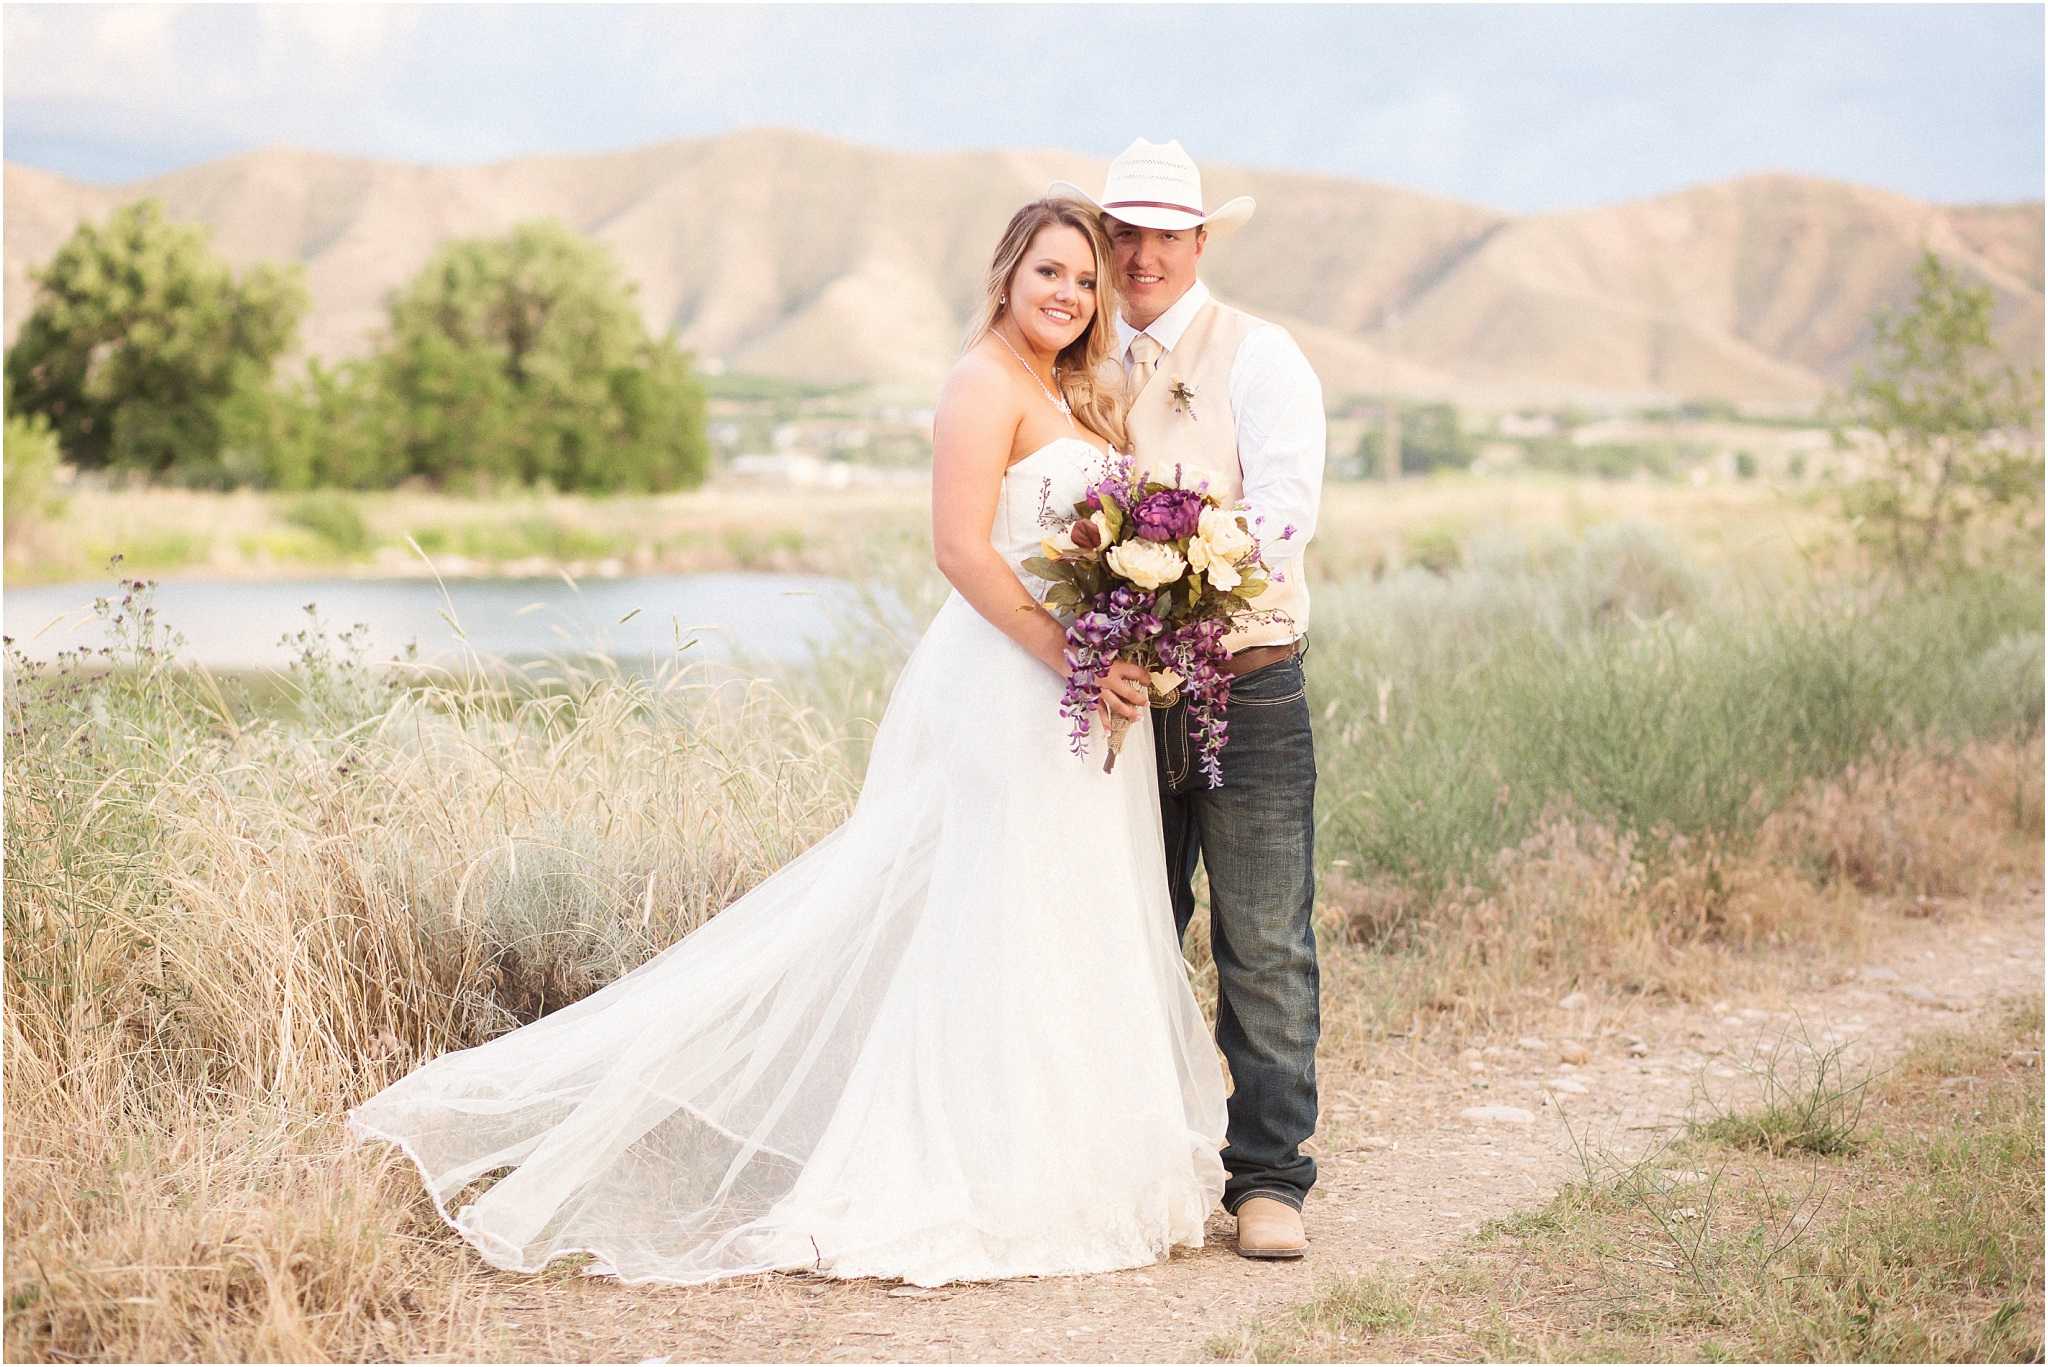 Wedding Photography_Emmett Idaho_Boise Idaho_Leah Southwick Photography_0051.jpg